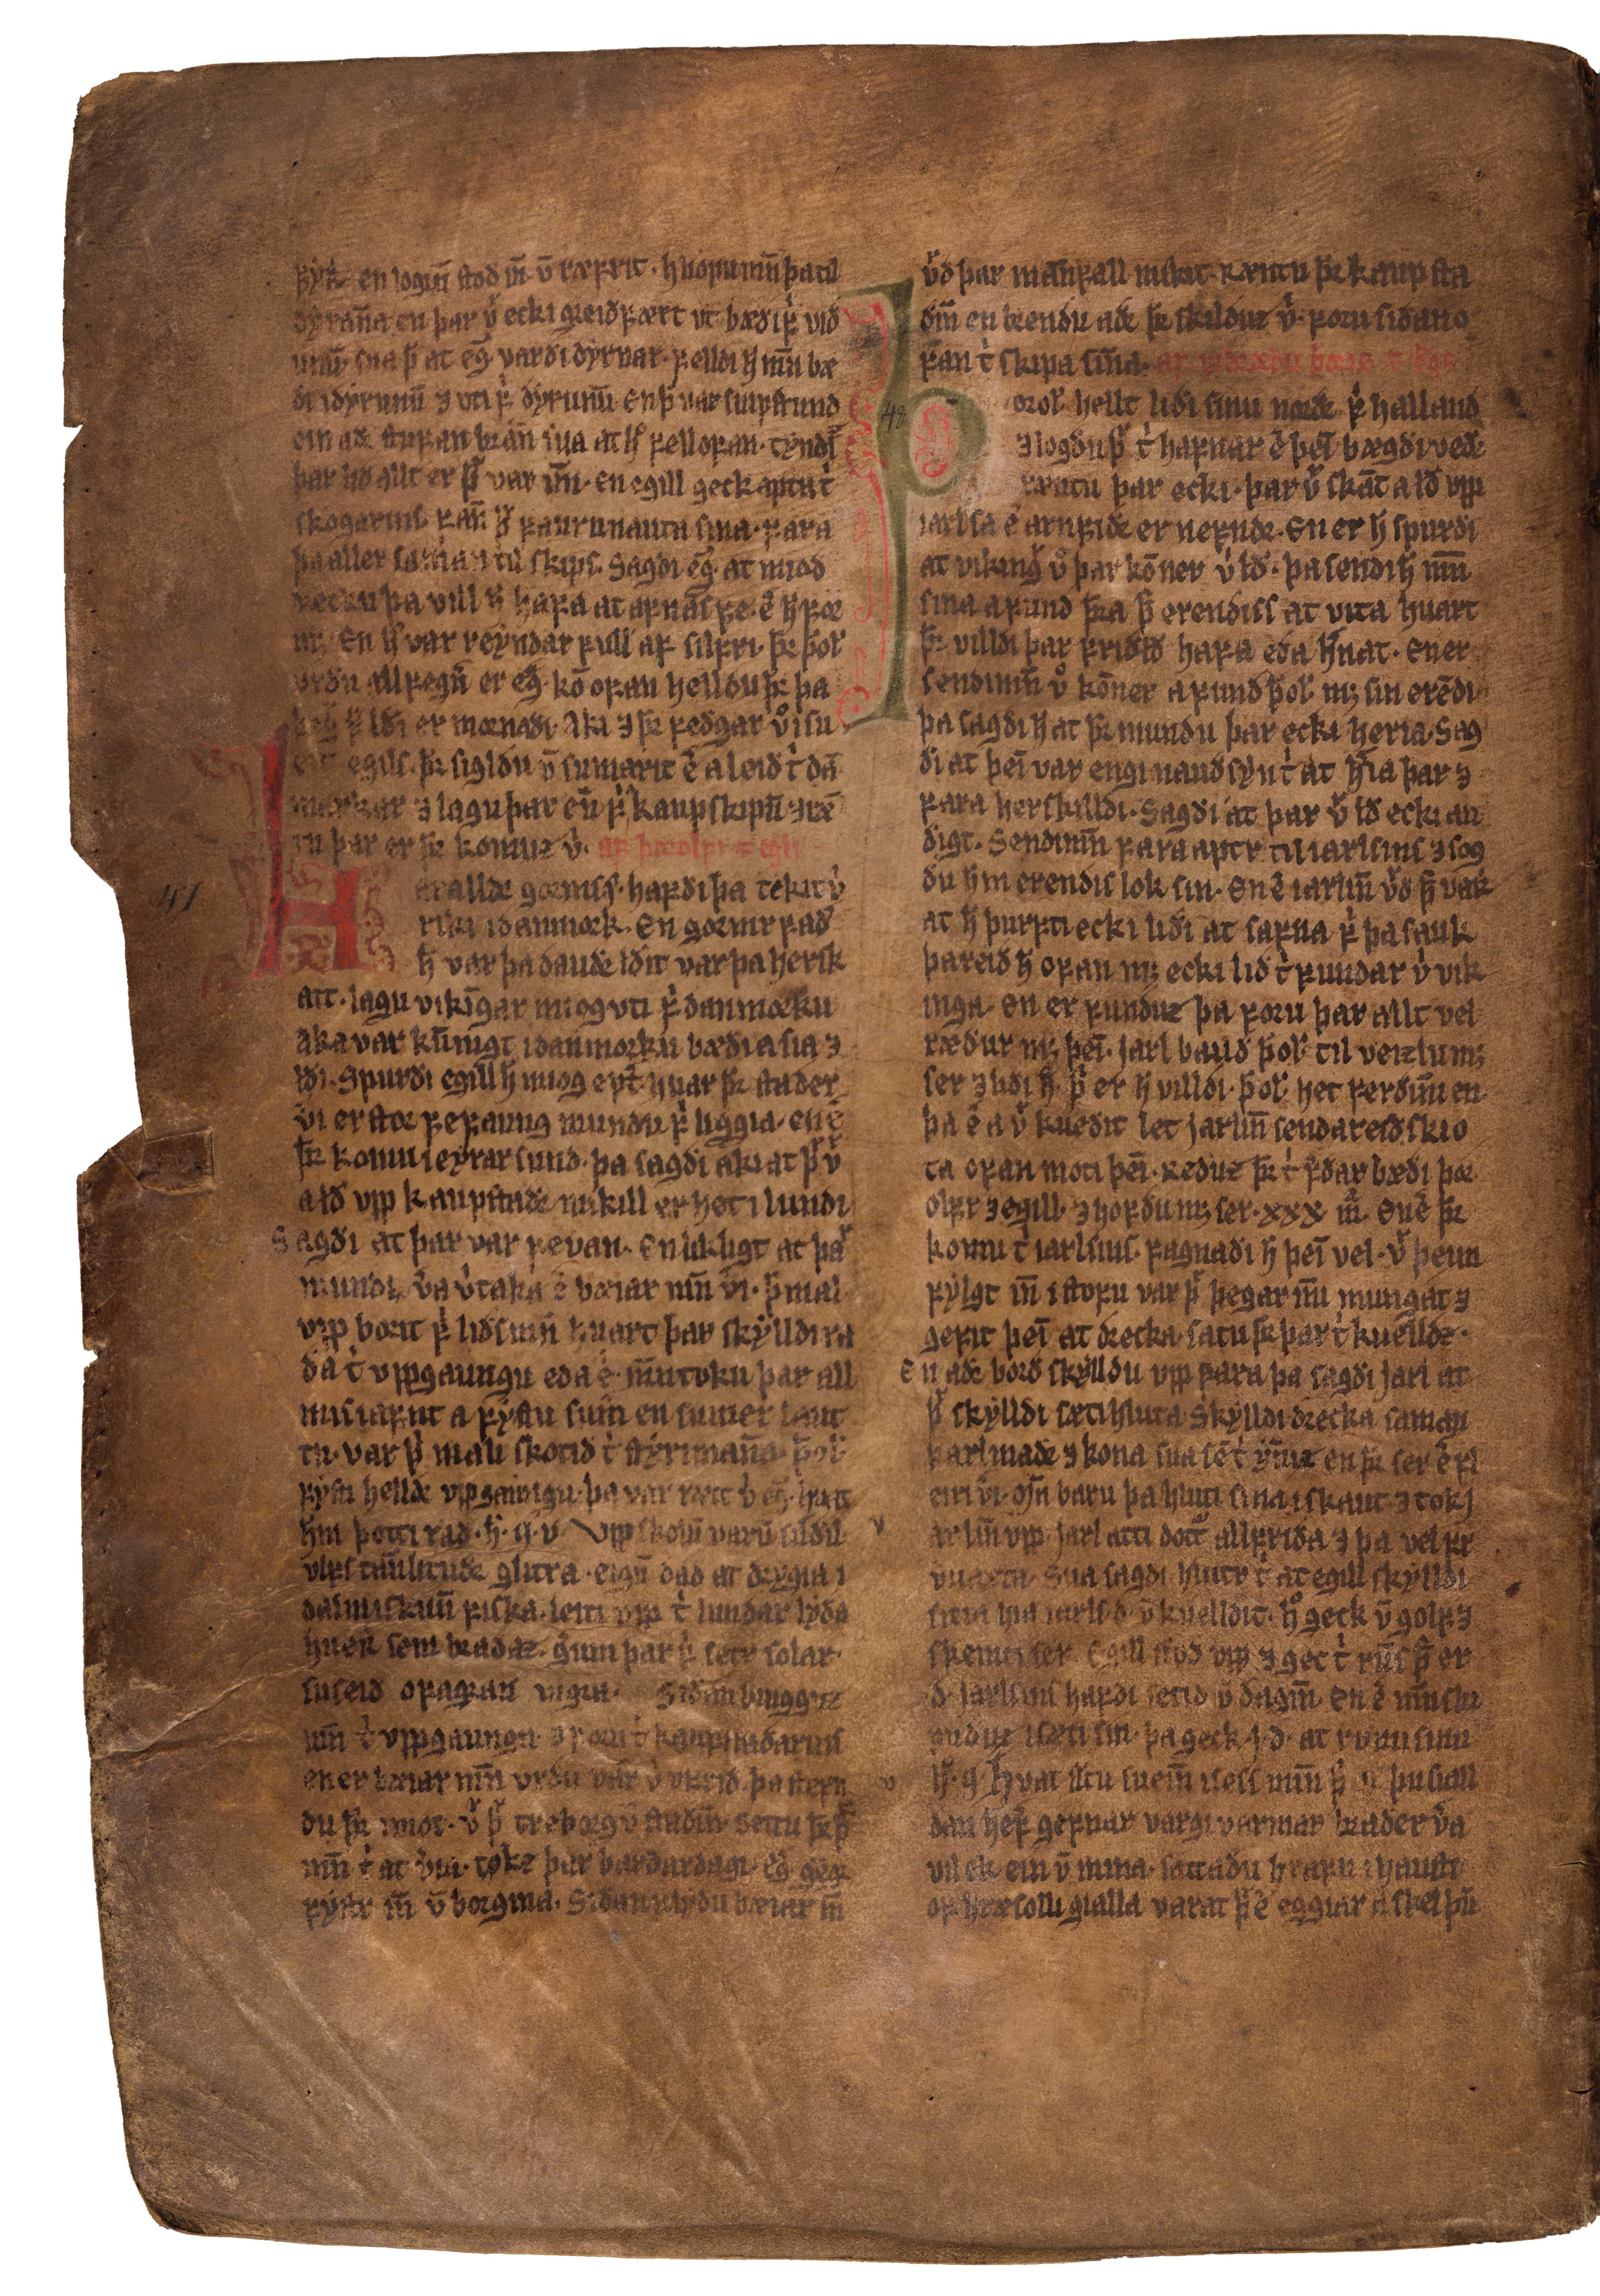 AM 132 fol - 78v